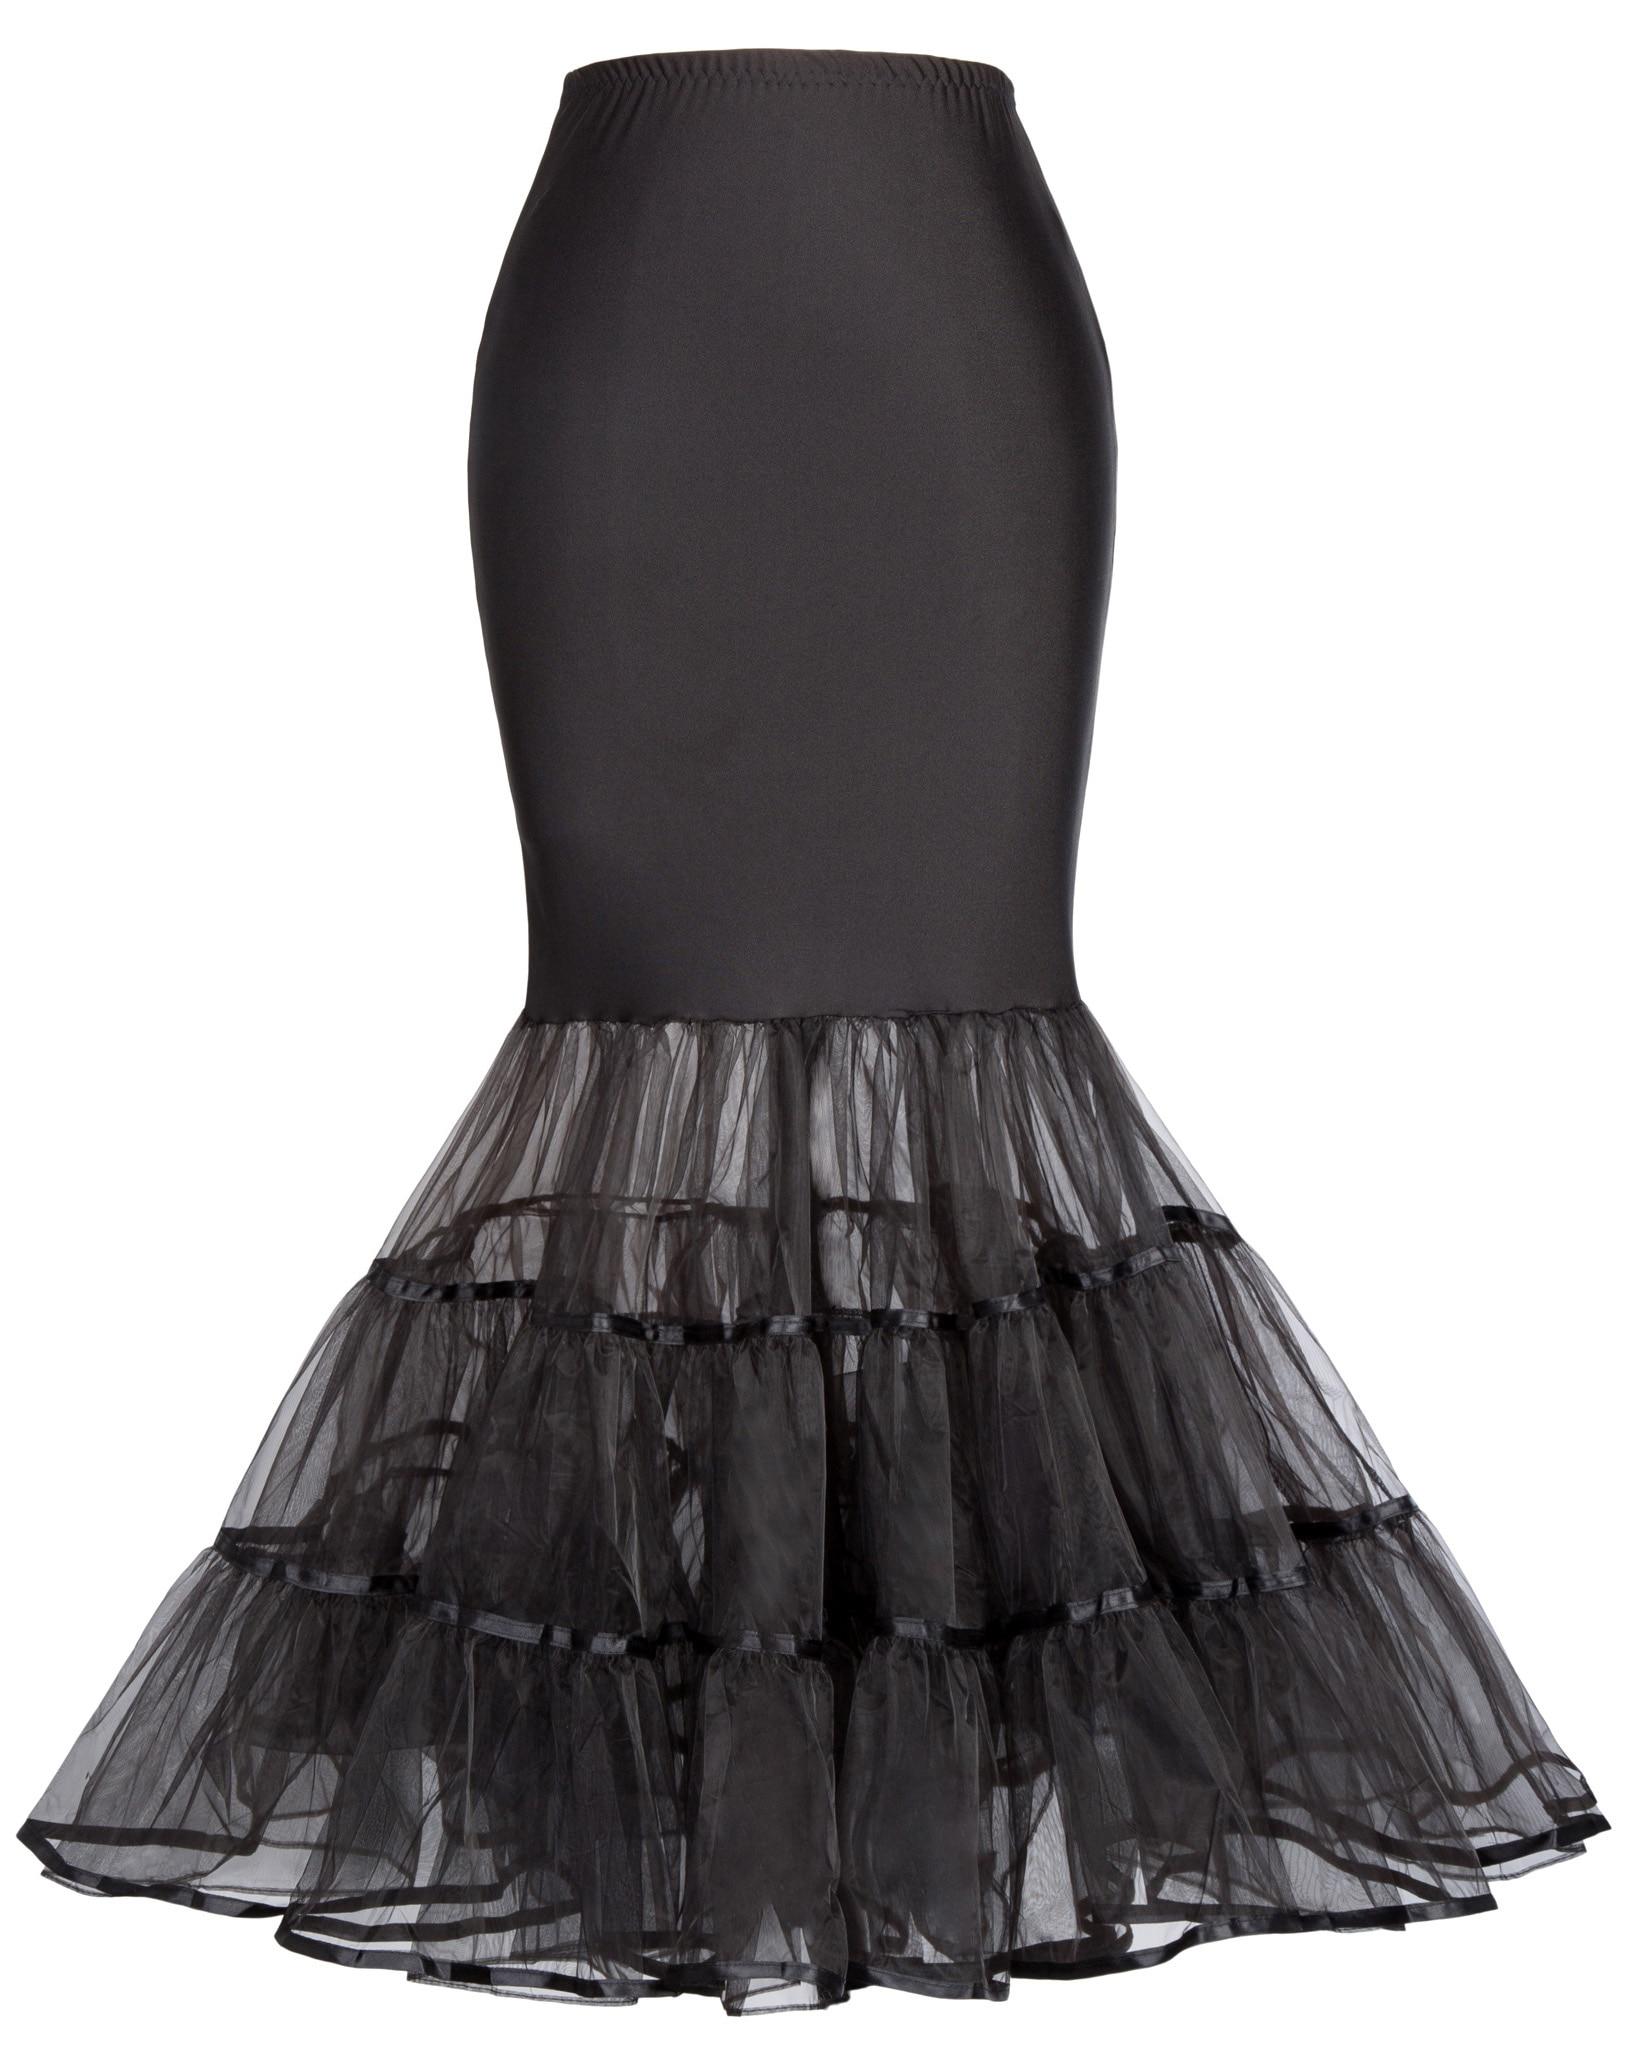 black tulle skirts Womens Vintage wedding party solid color long skirt Crinoline Underskirt Mermaid high waist Petticoat skirt